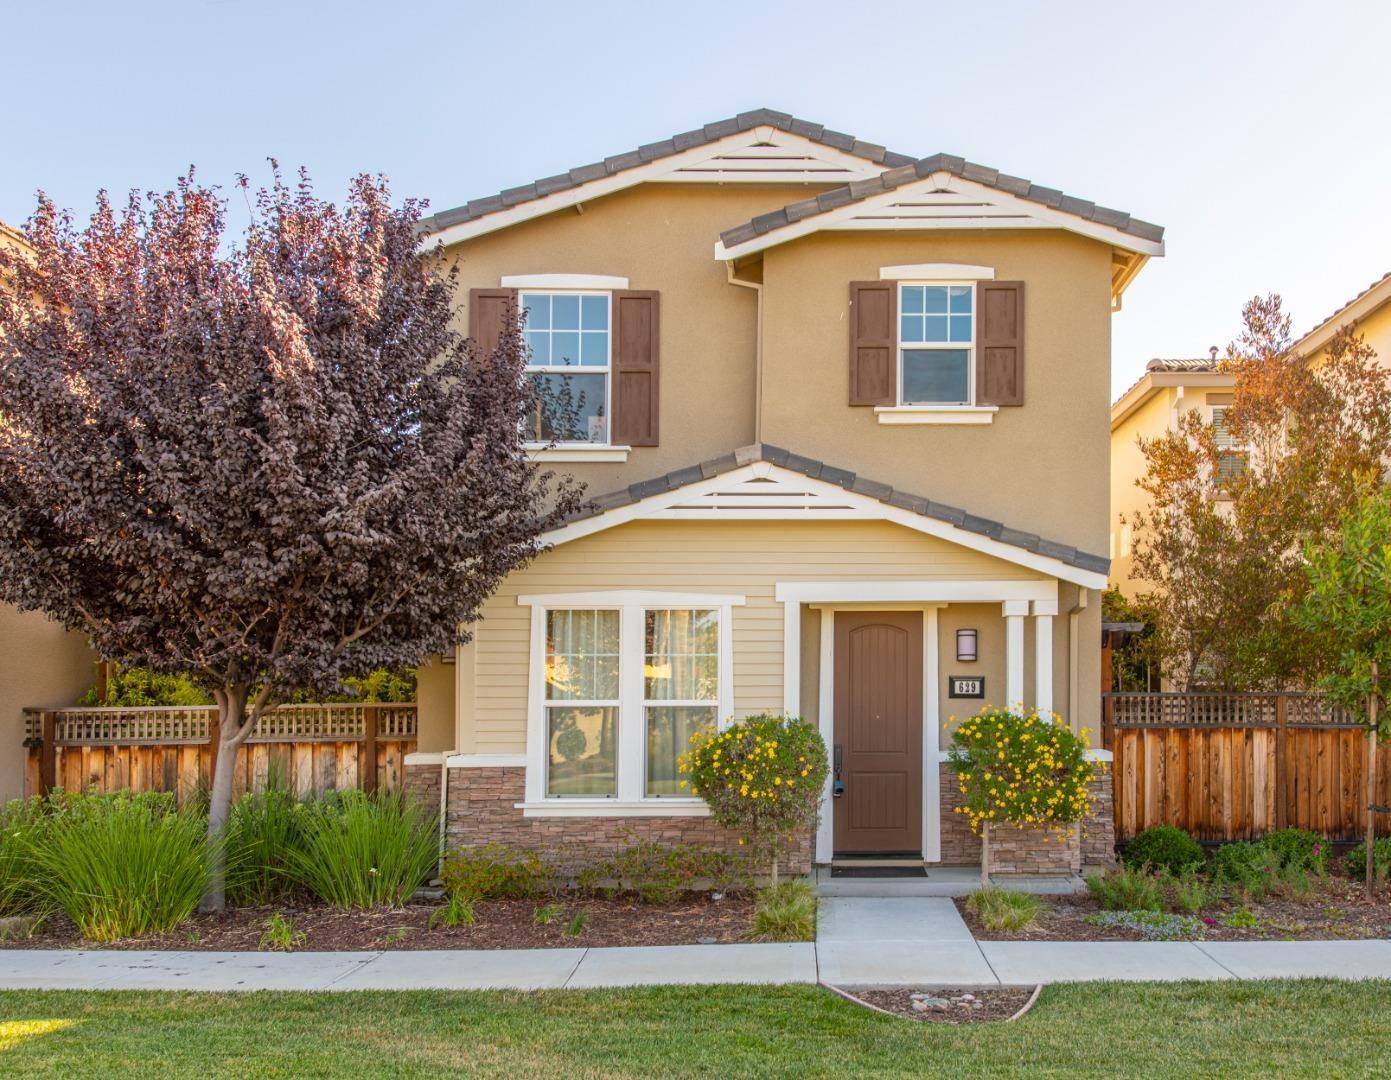 629 Montage Circle, East Palo Alto, CA 94303 - #: ML81864691